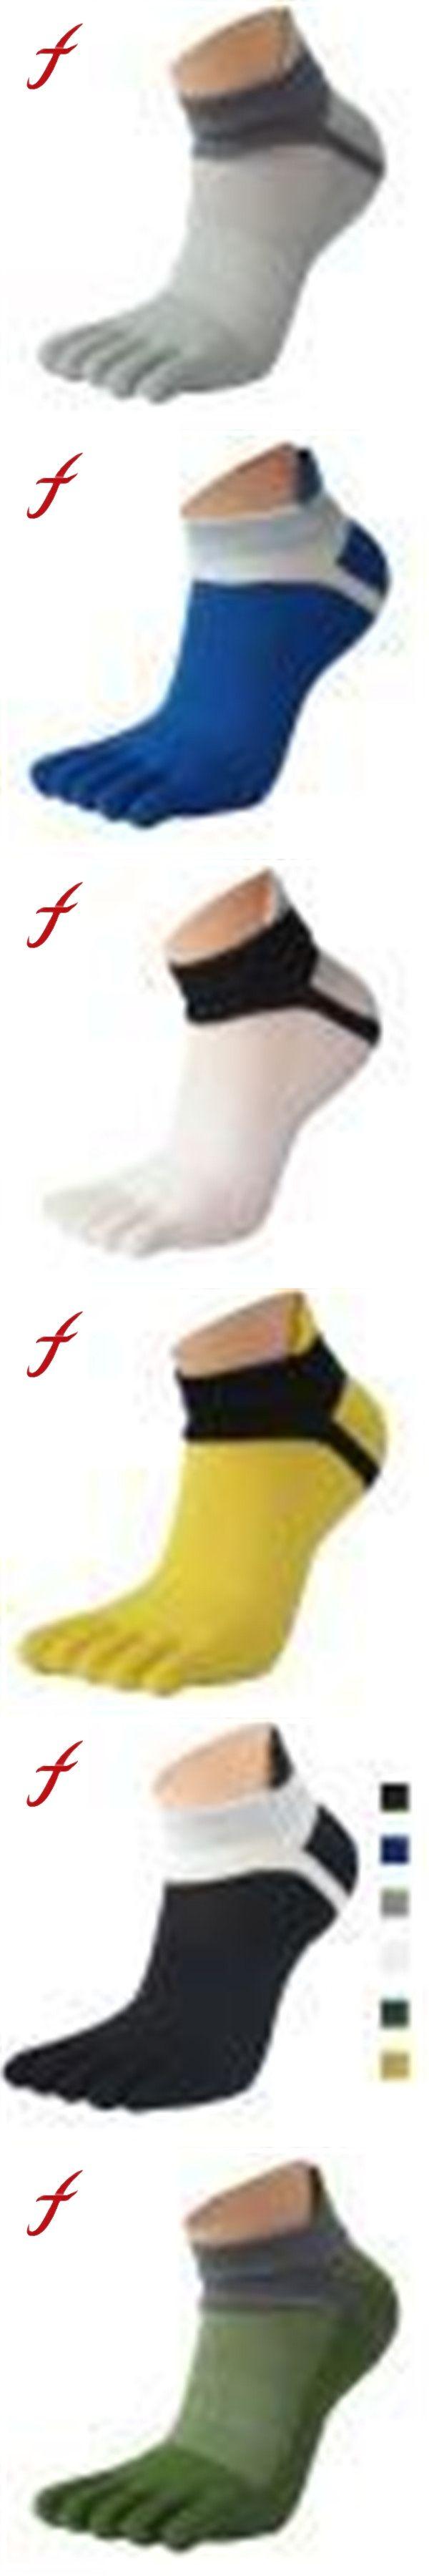 1 Pair Socks Men Mesh Meias Workout Five Finger Toe Socks 2017 High Quality Casual Breathable 6 Colors Short Socks For Men